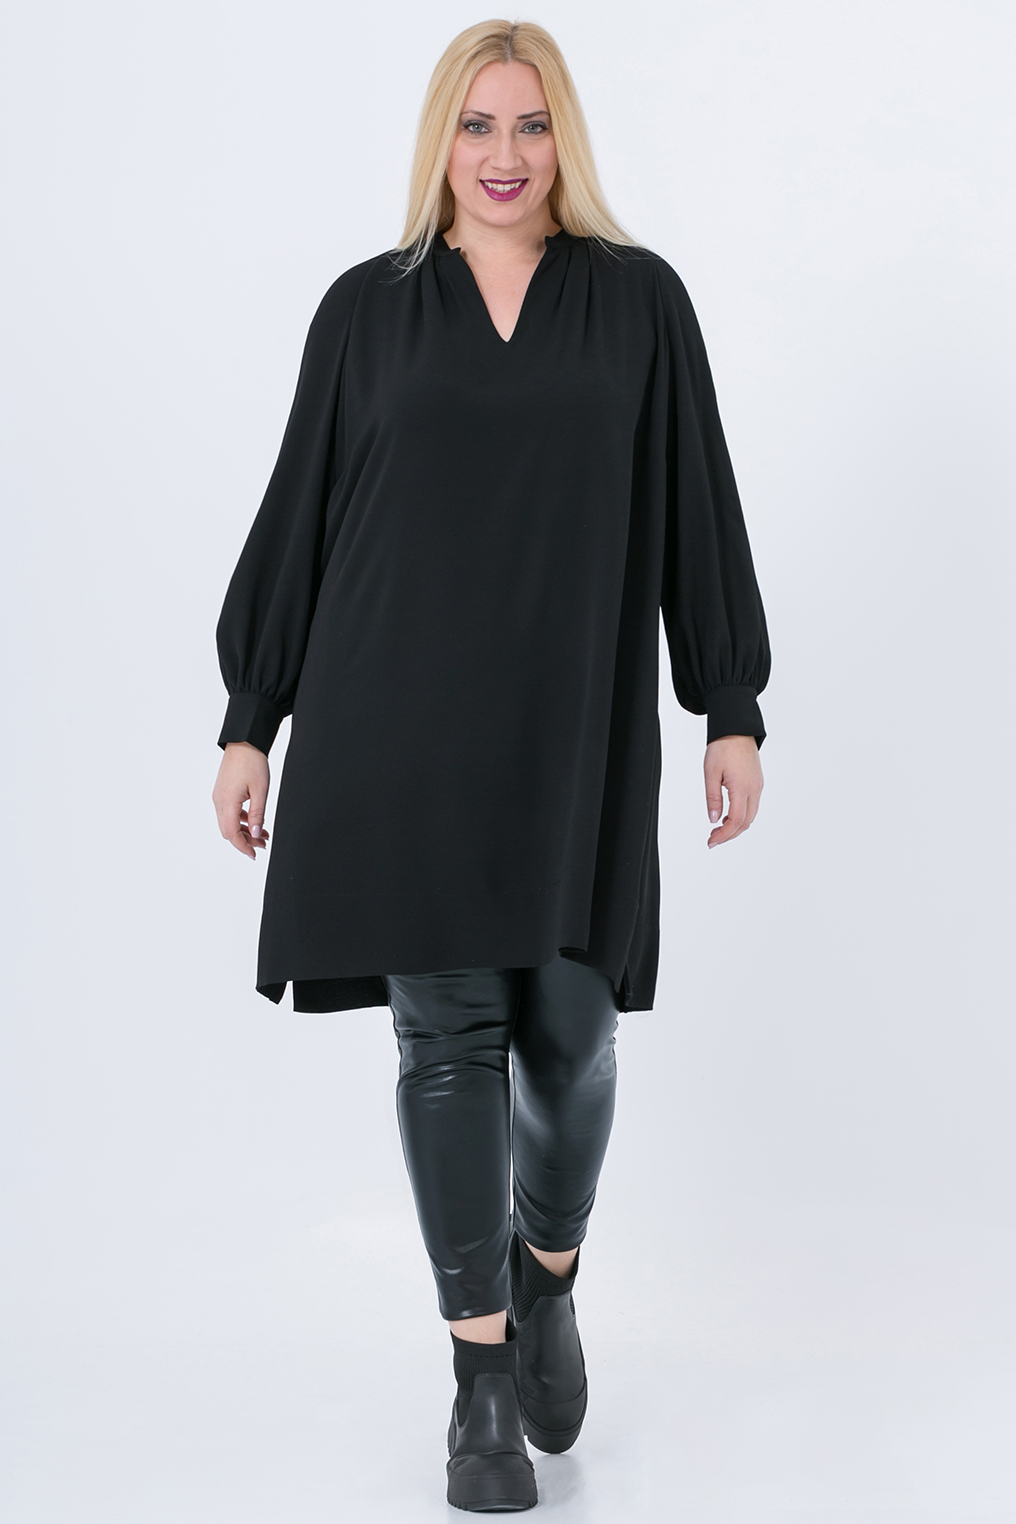 Tuniek Mat fashion pofmouwen